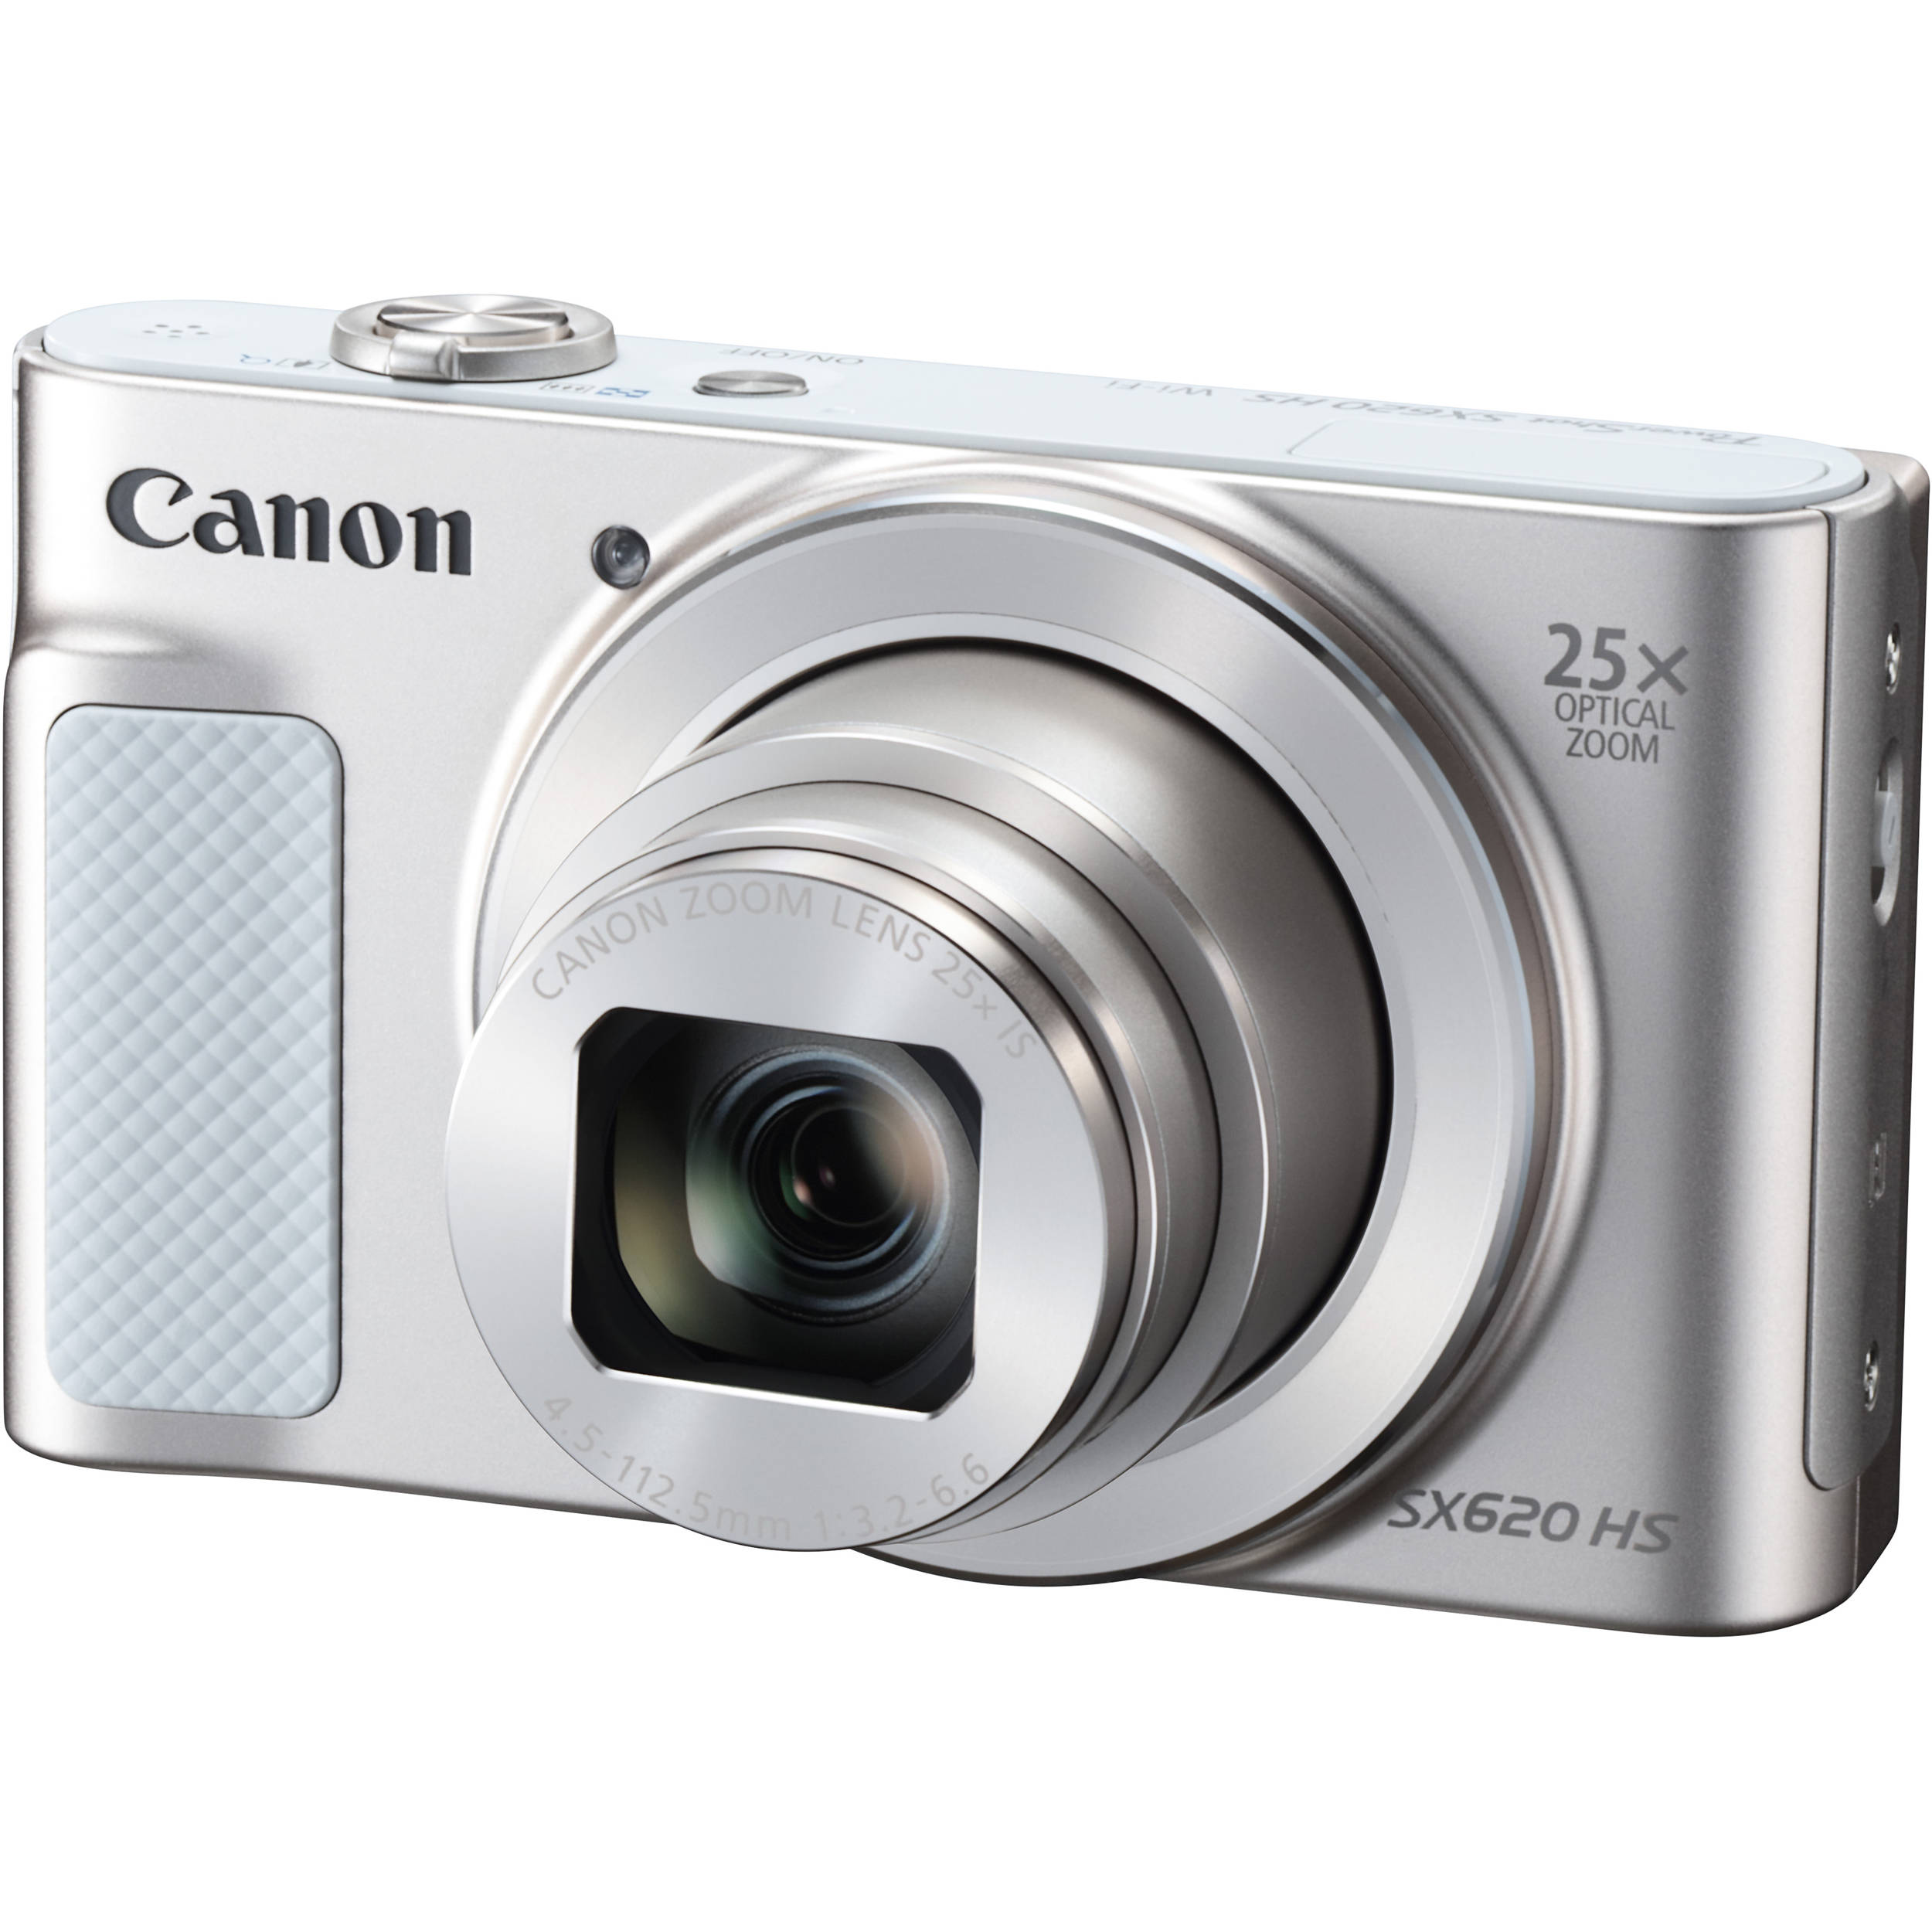 Canon PowerShot SX620 HS Digital Camera (Silver) 1074C001 B&H